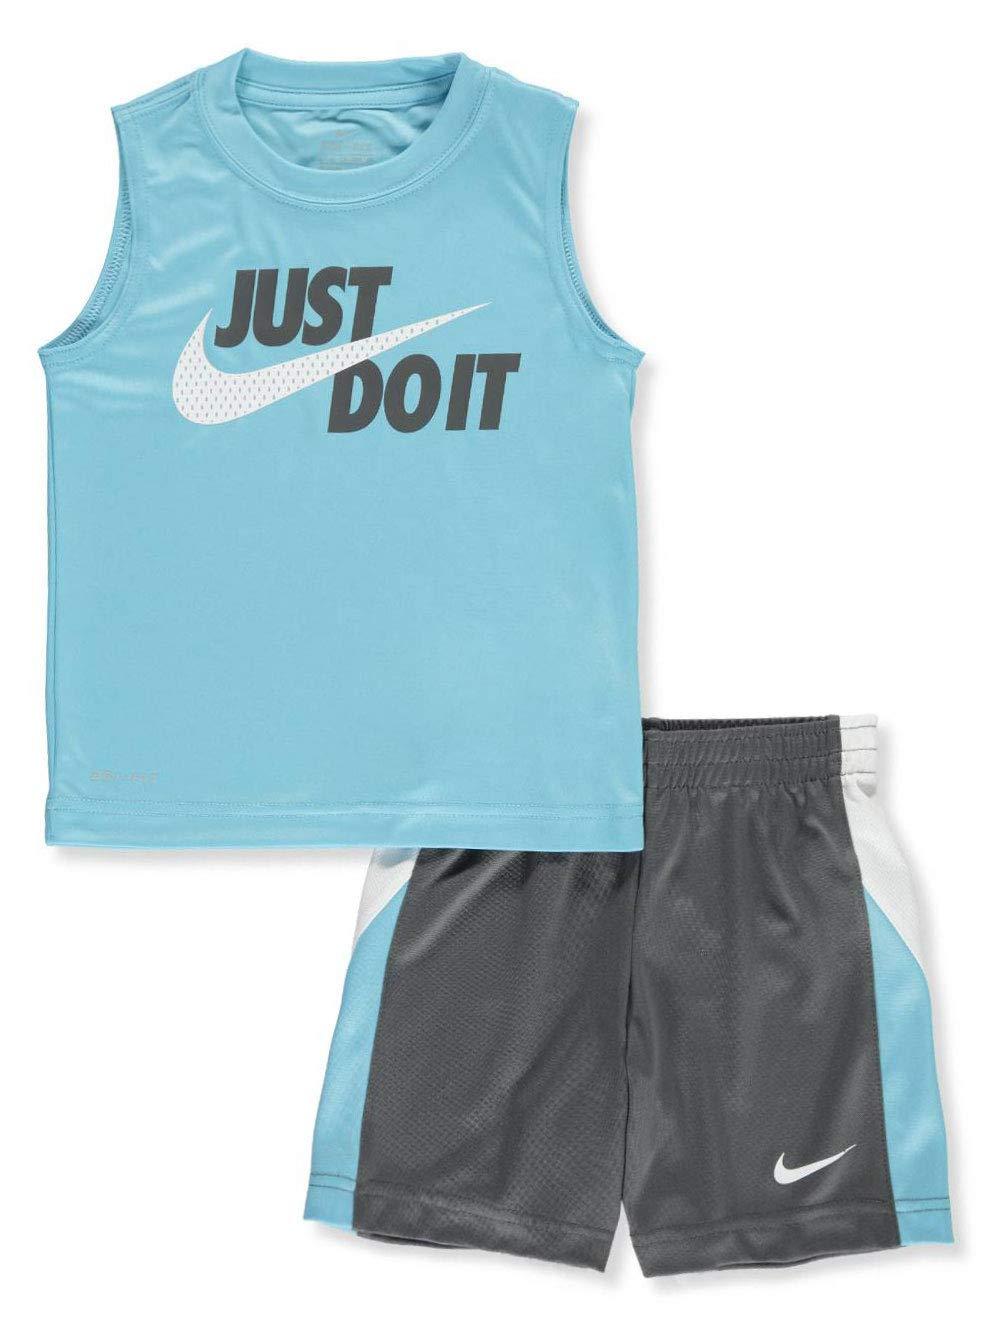 Nike Boys' 2-Piece Shorts Set Outfit - Dark Gray/Light Blue, 7